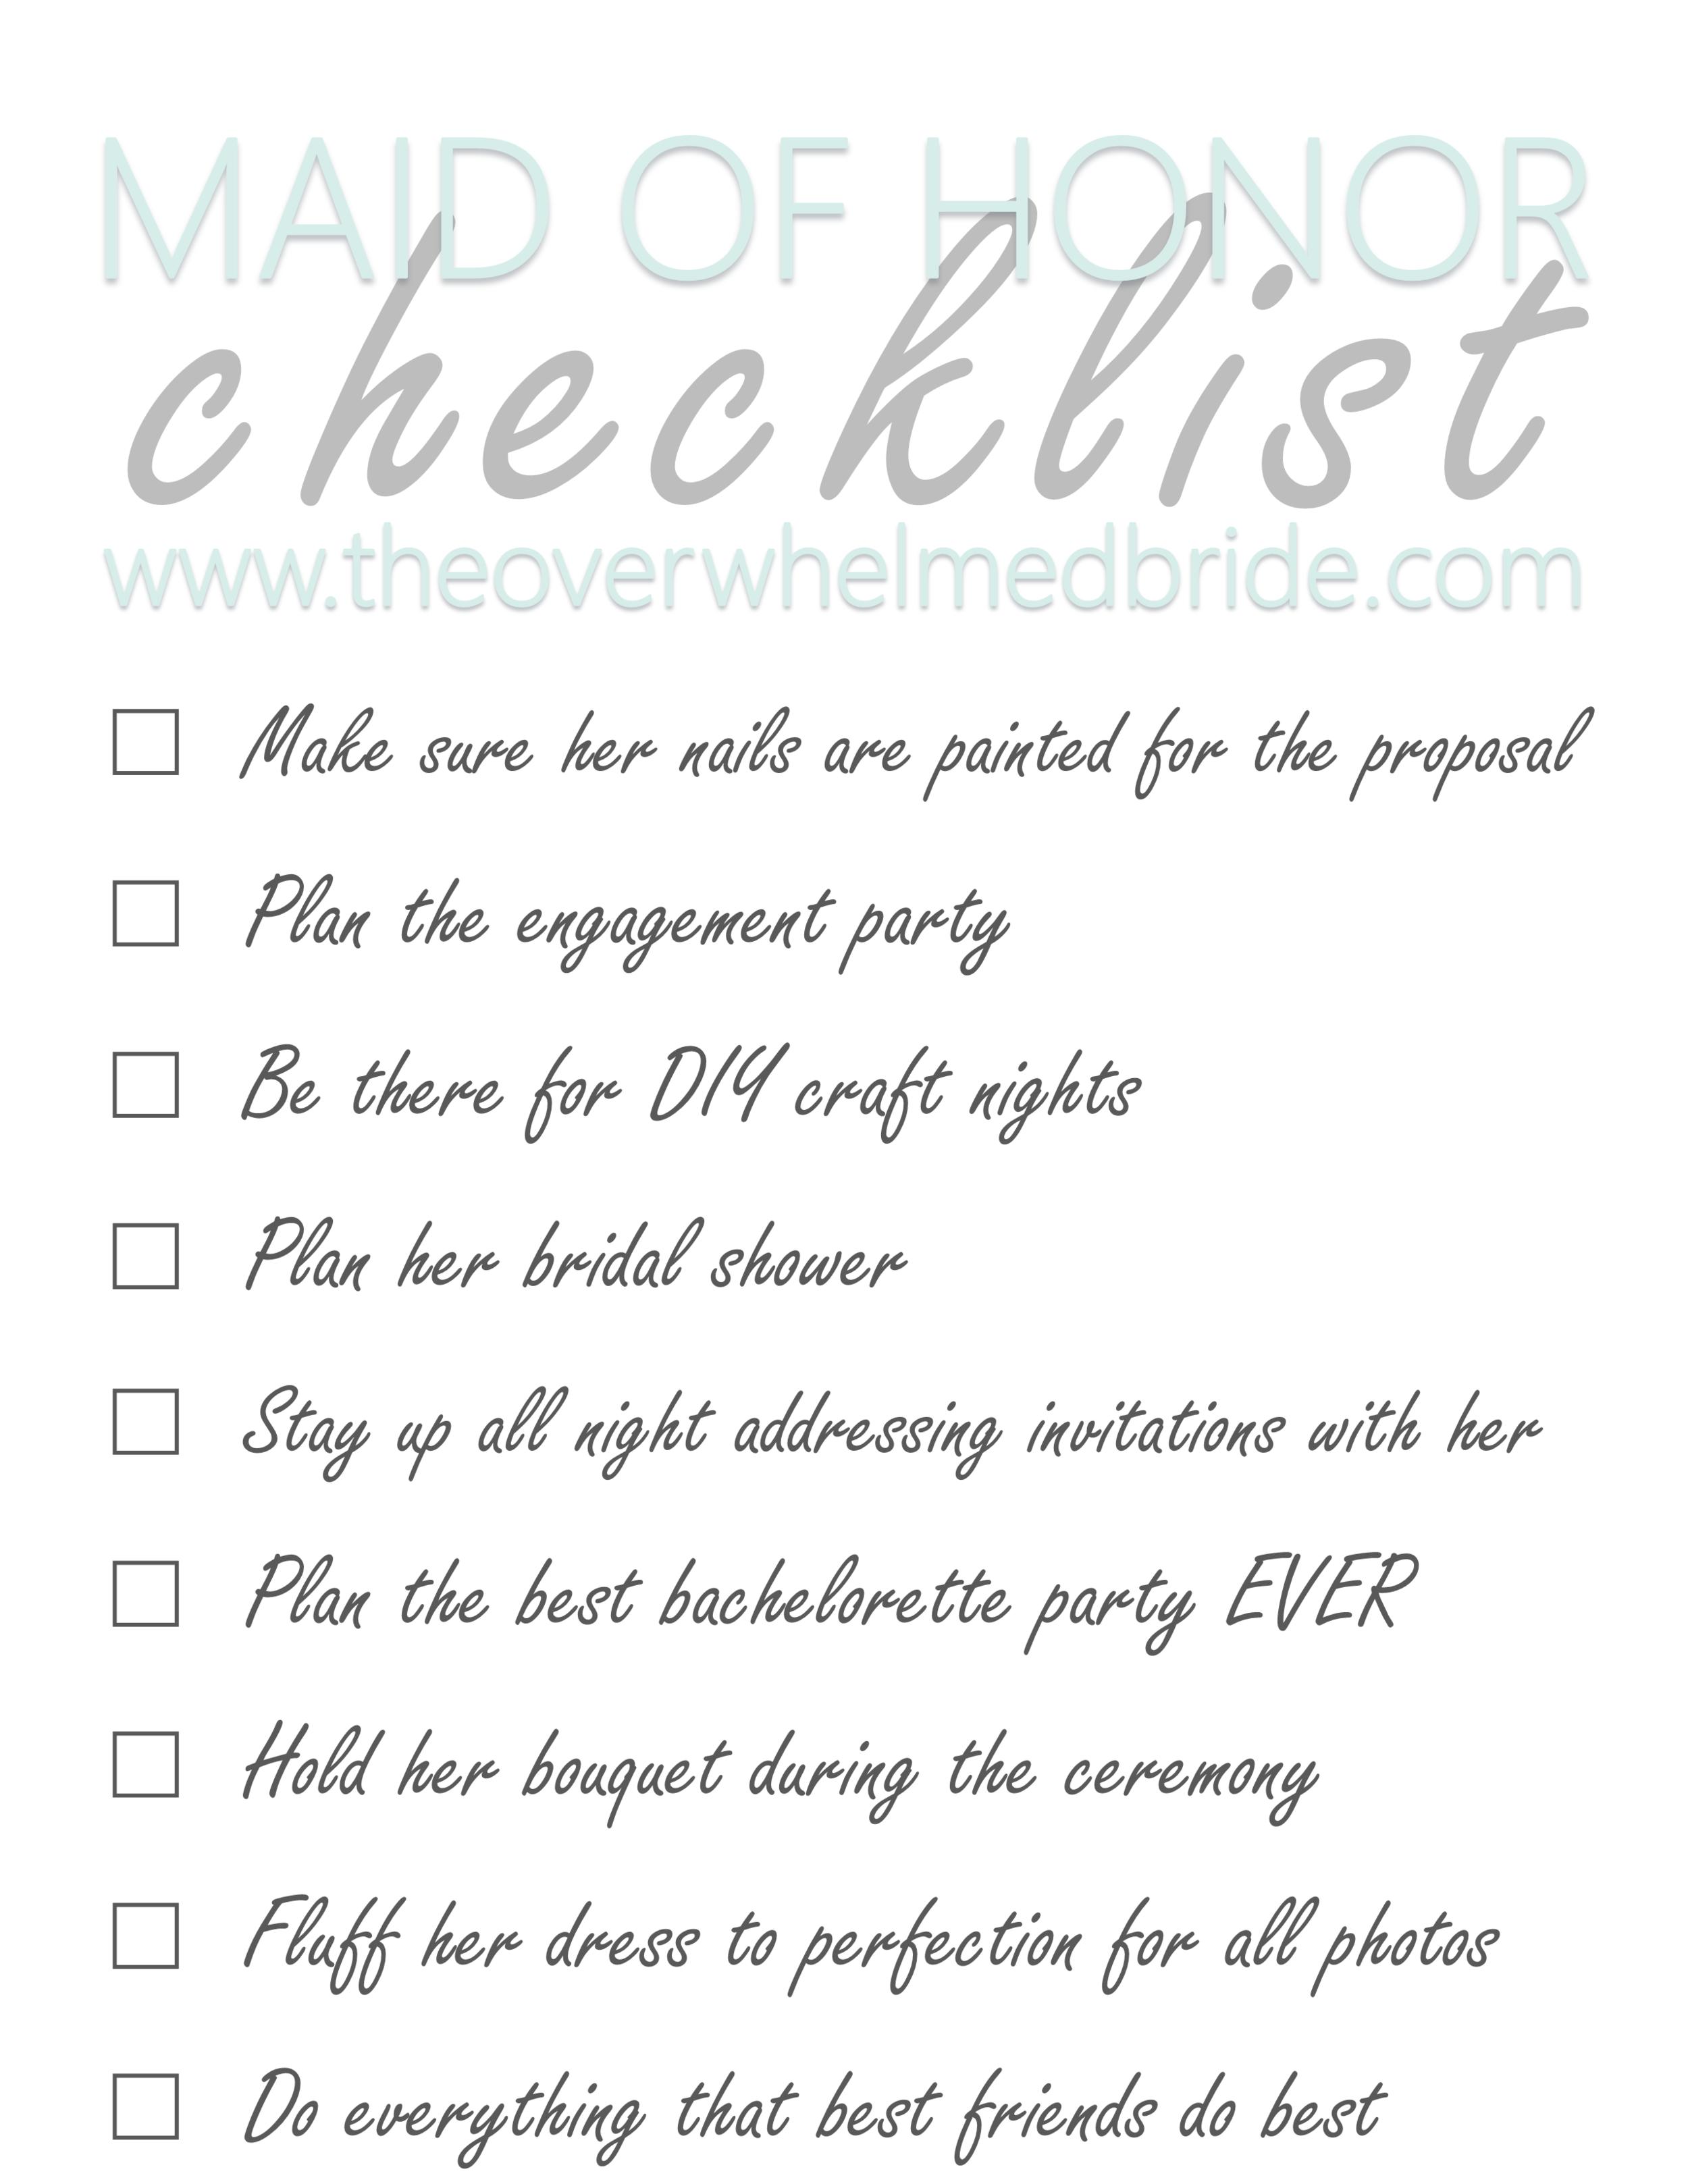 Maid of Honor Checklist - The Overwhelmed Bride // Bridal Lifestyle + Wedding Blog